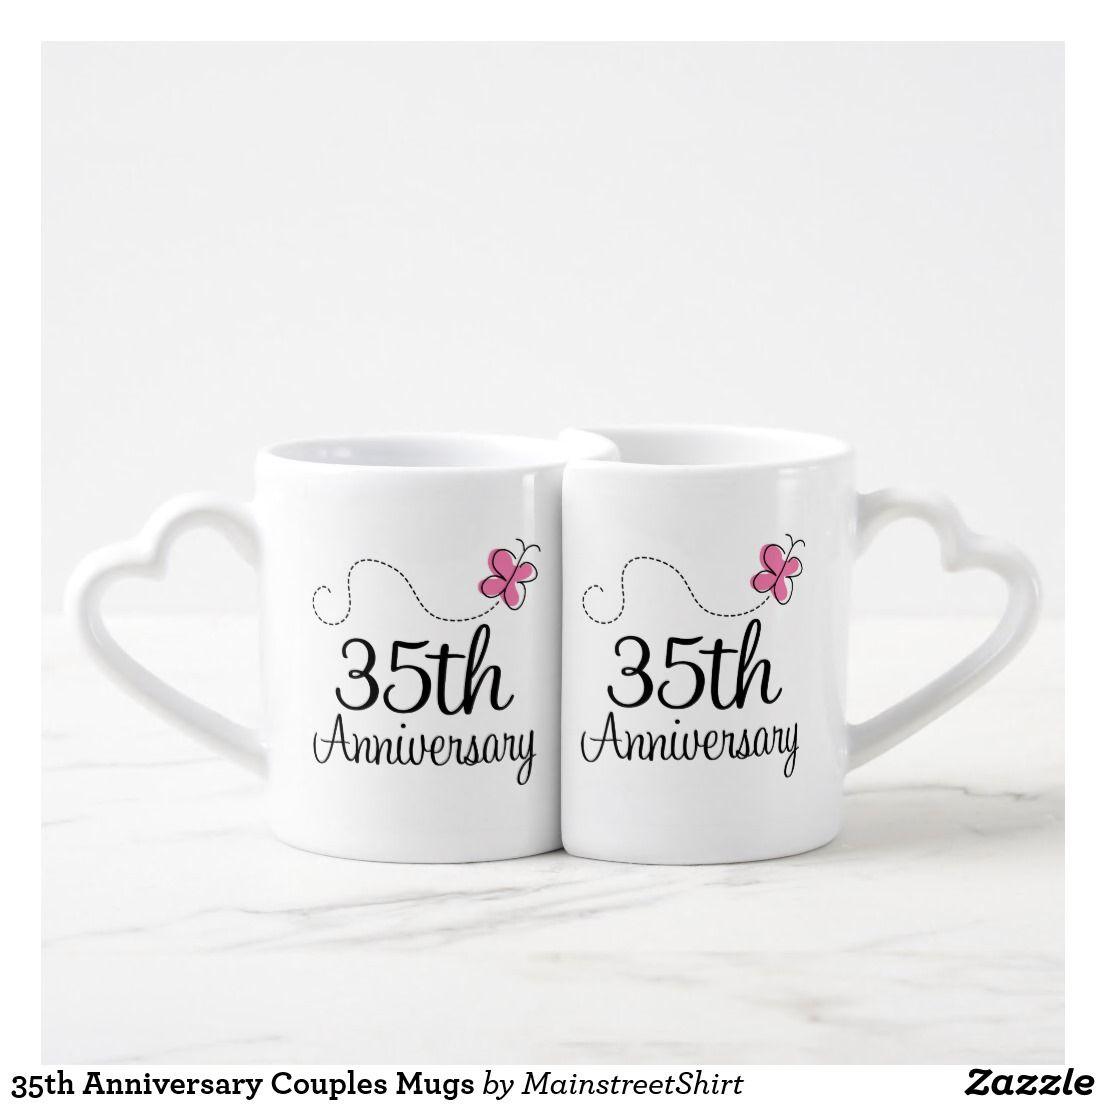 35th Anniversary Couples Mugs Couple mugs